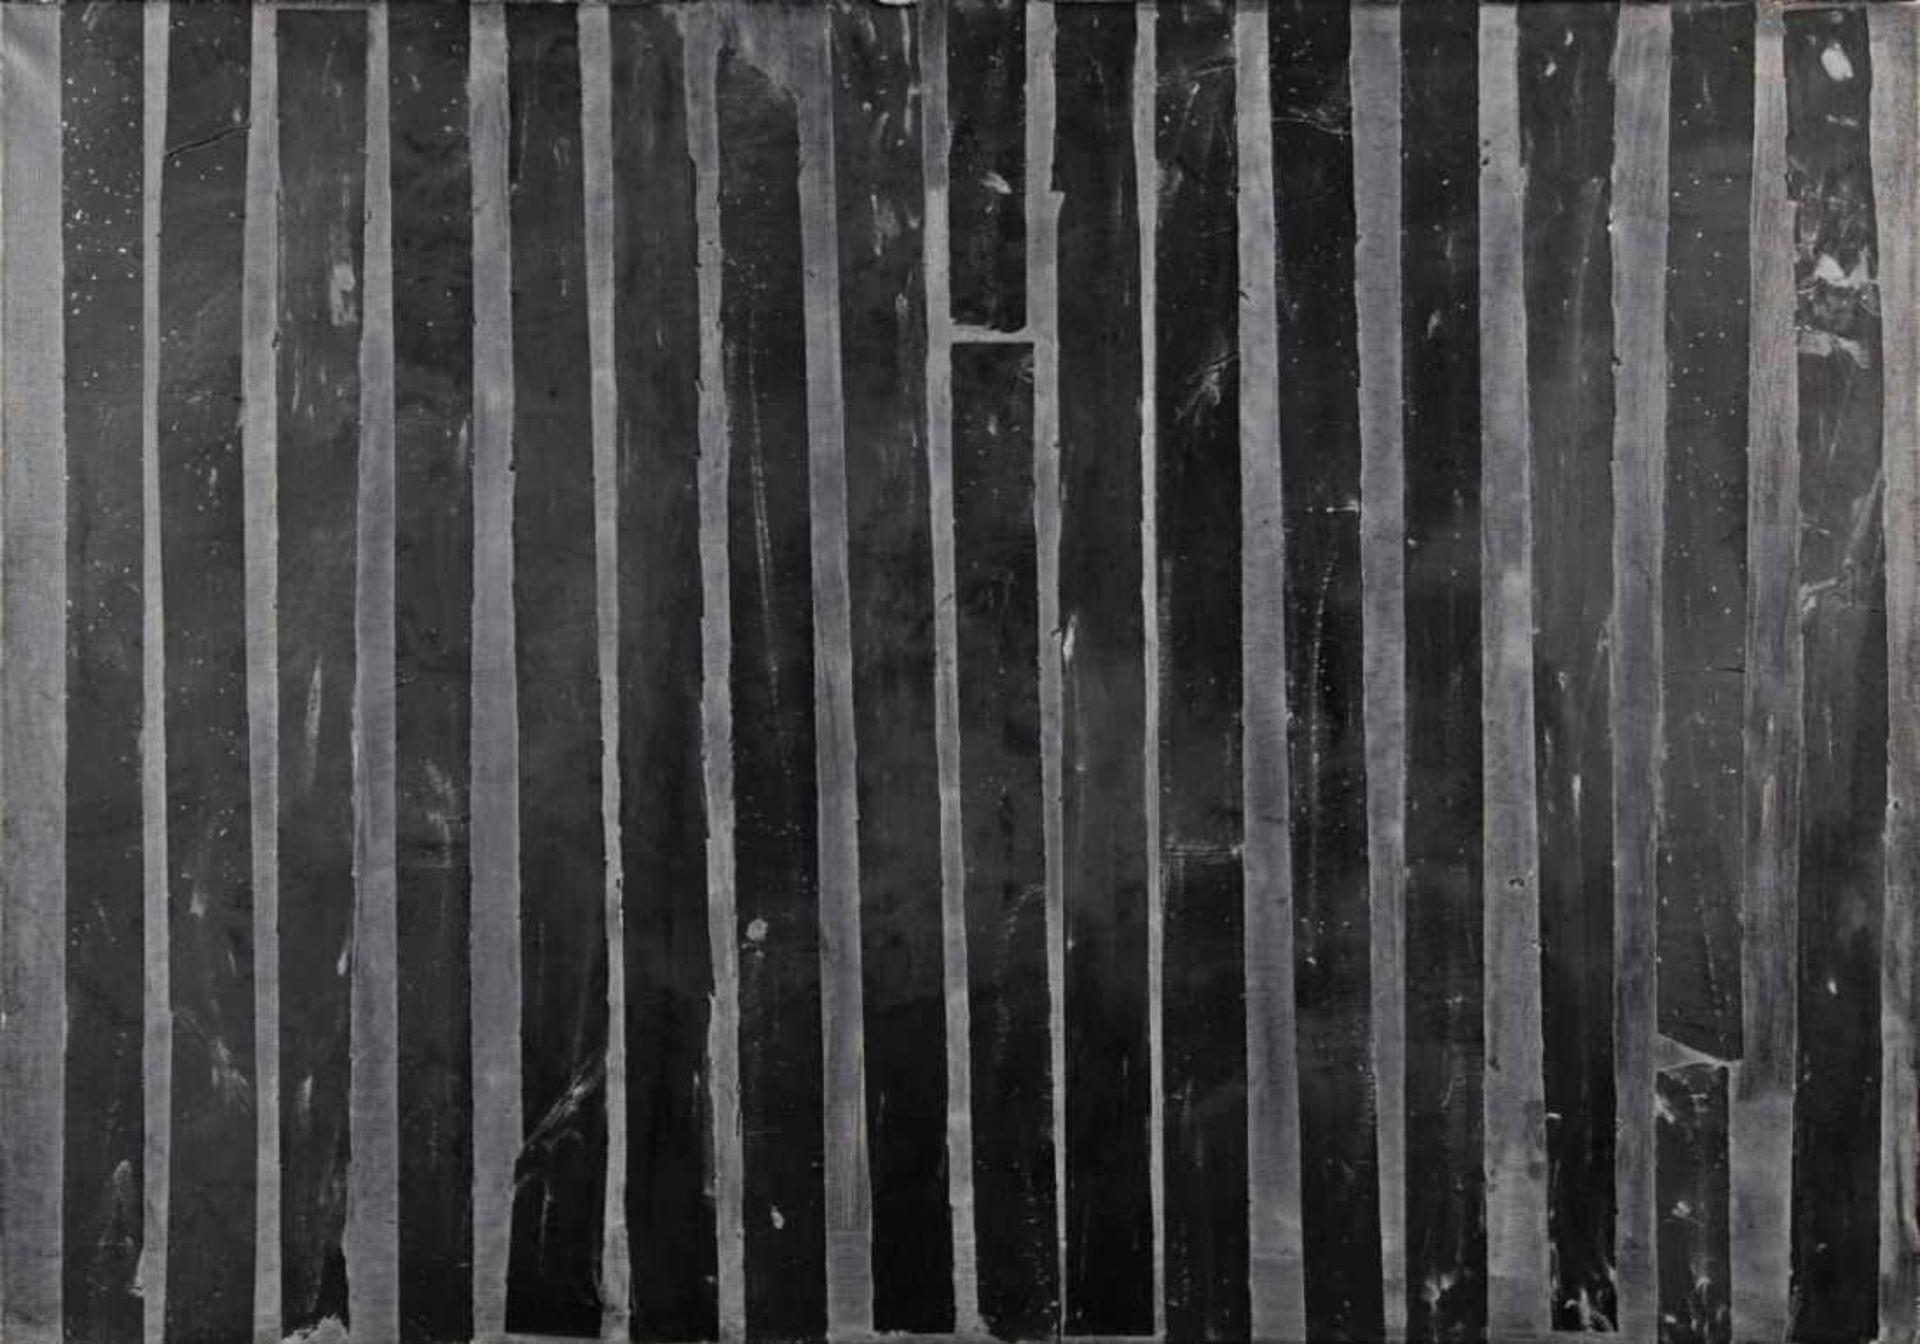 RUDI STANZEL(1958 LINZ)NINGBO 38, 2006Papier, Tinte, Acryl auf Leinwand, 70 x 100 cmSignatur